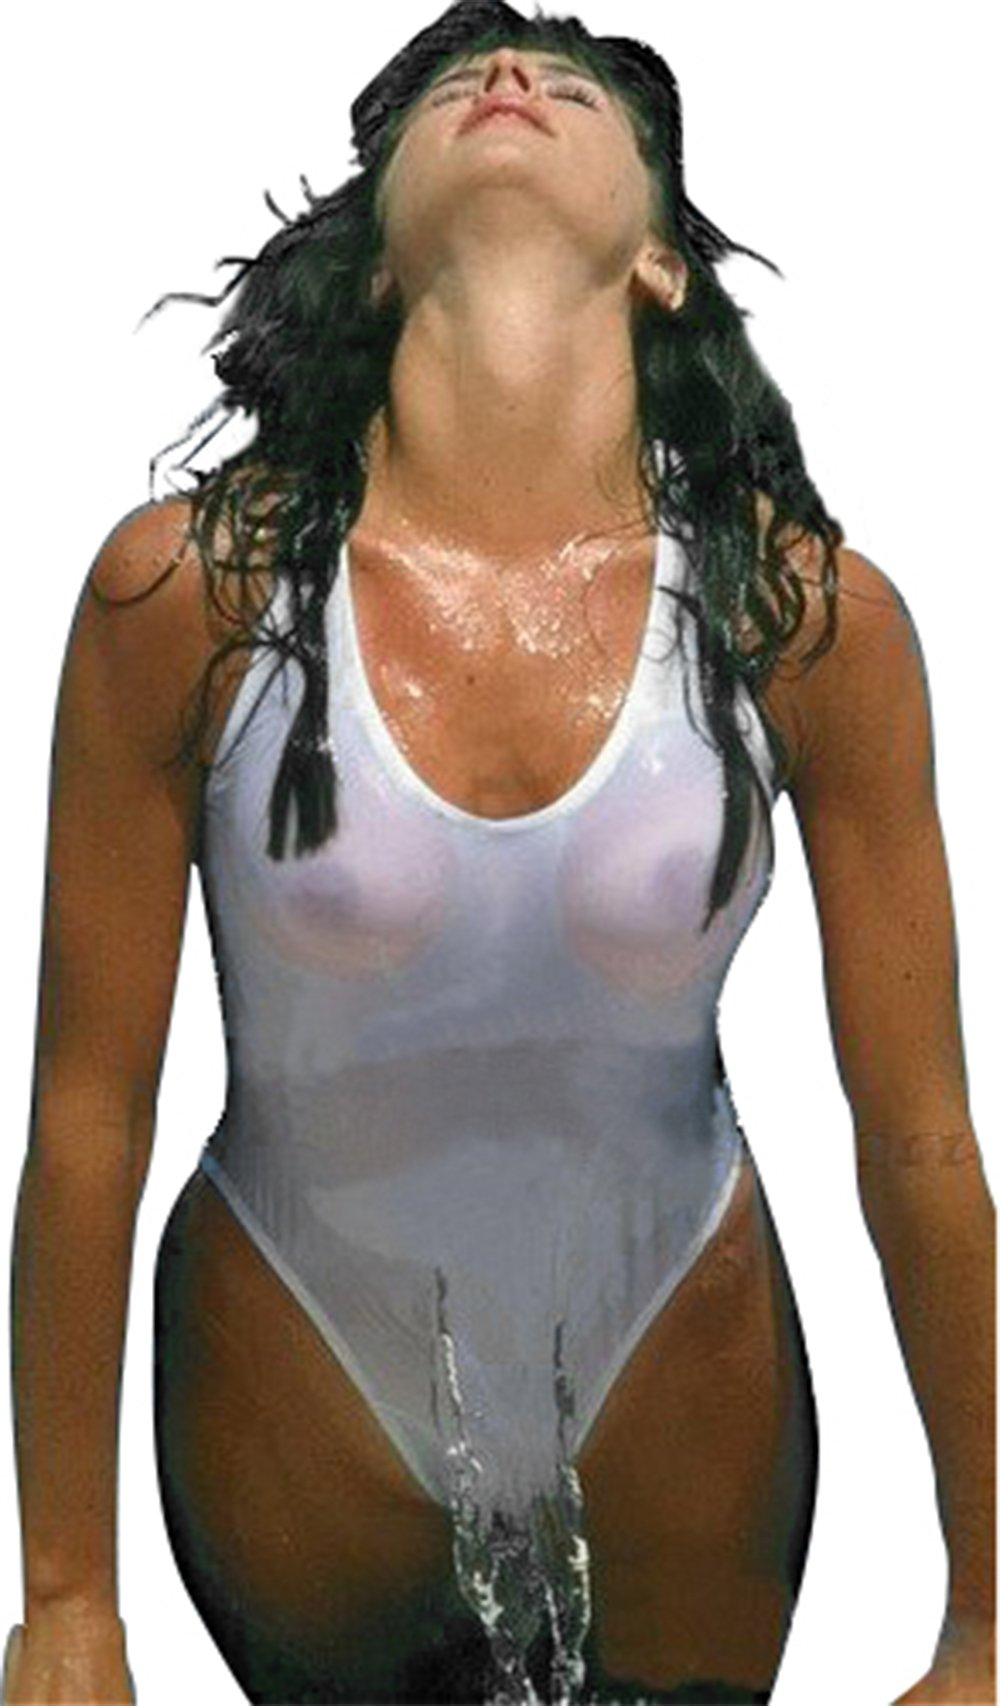 Princesa Carioca Brasil Damen Bikini Erotisch Transparent aus Brasilien Farbe: Weiß B48